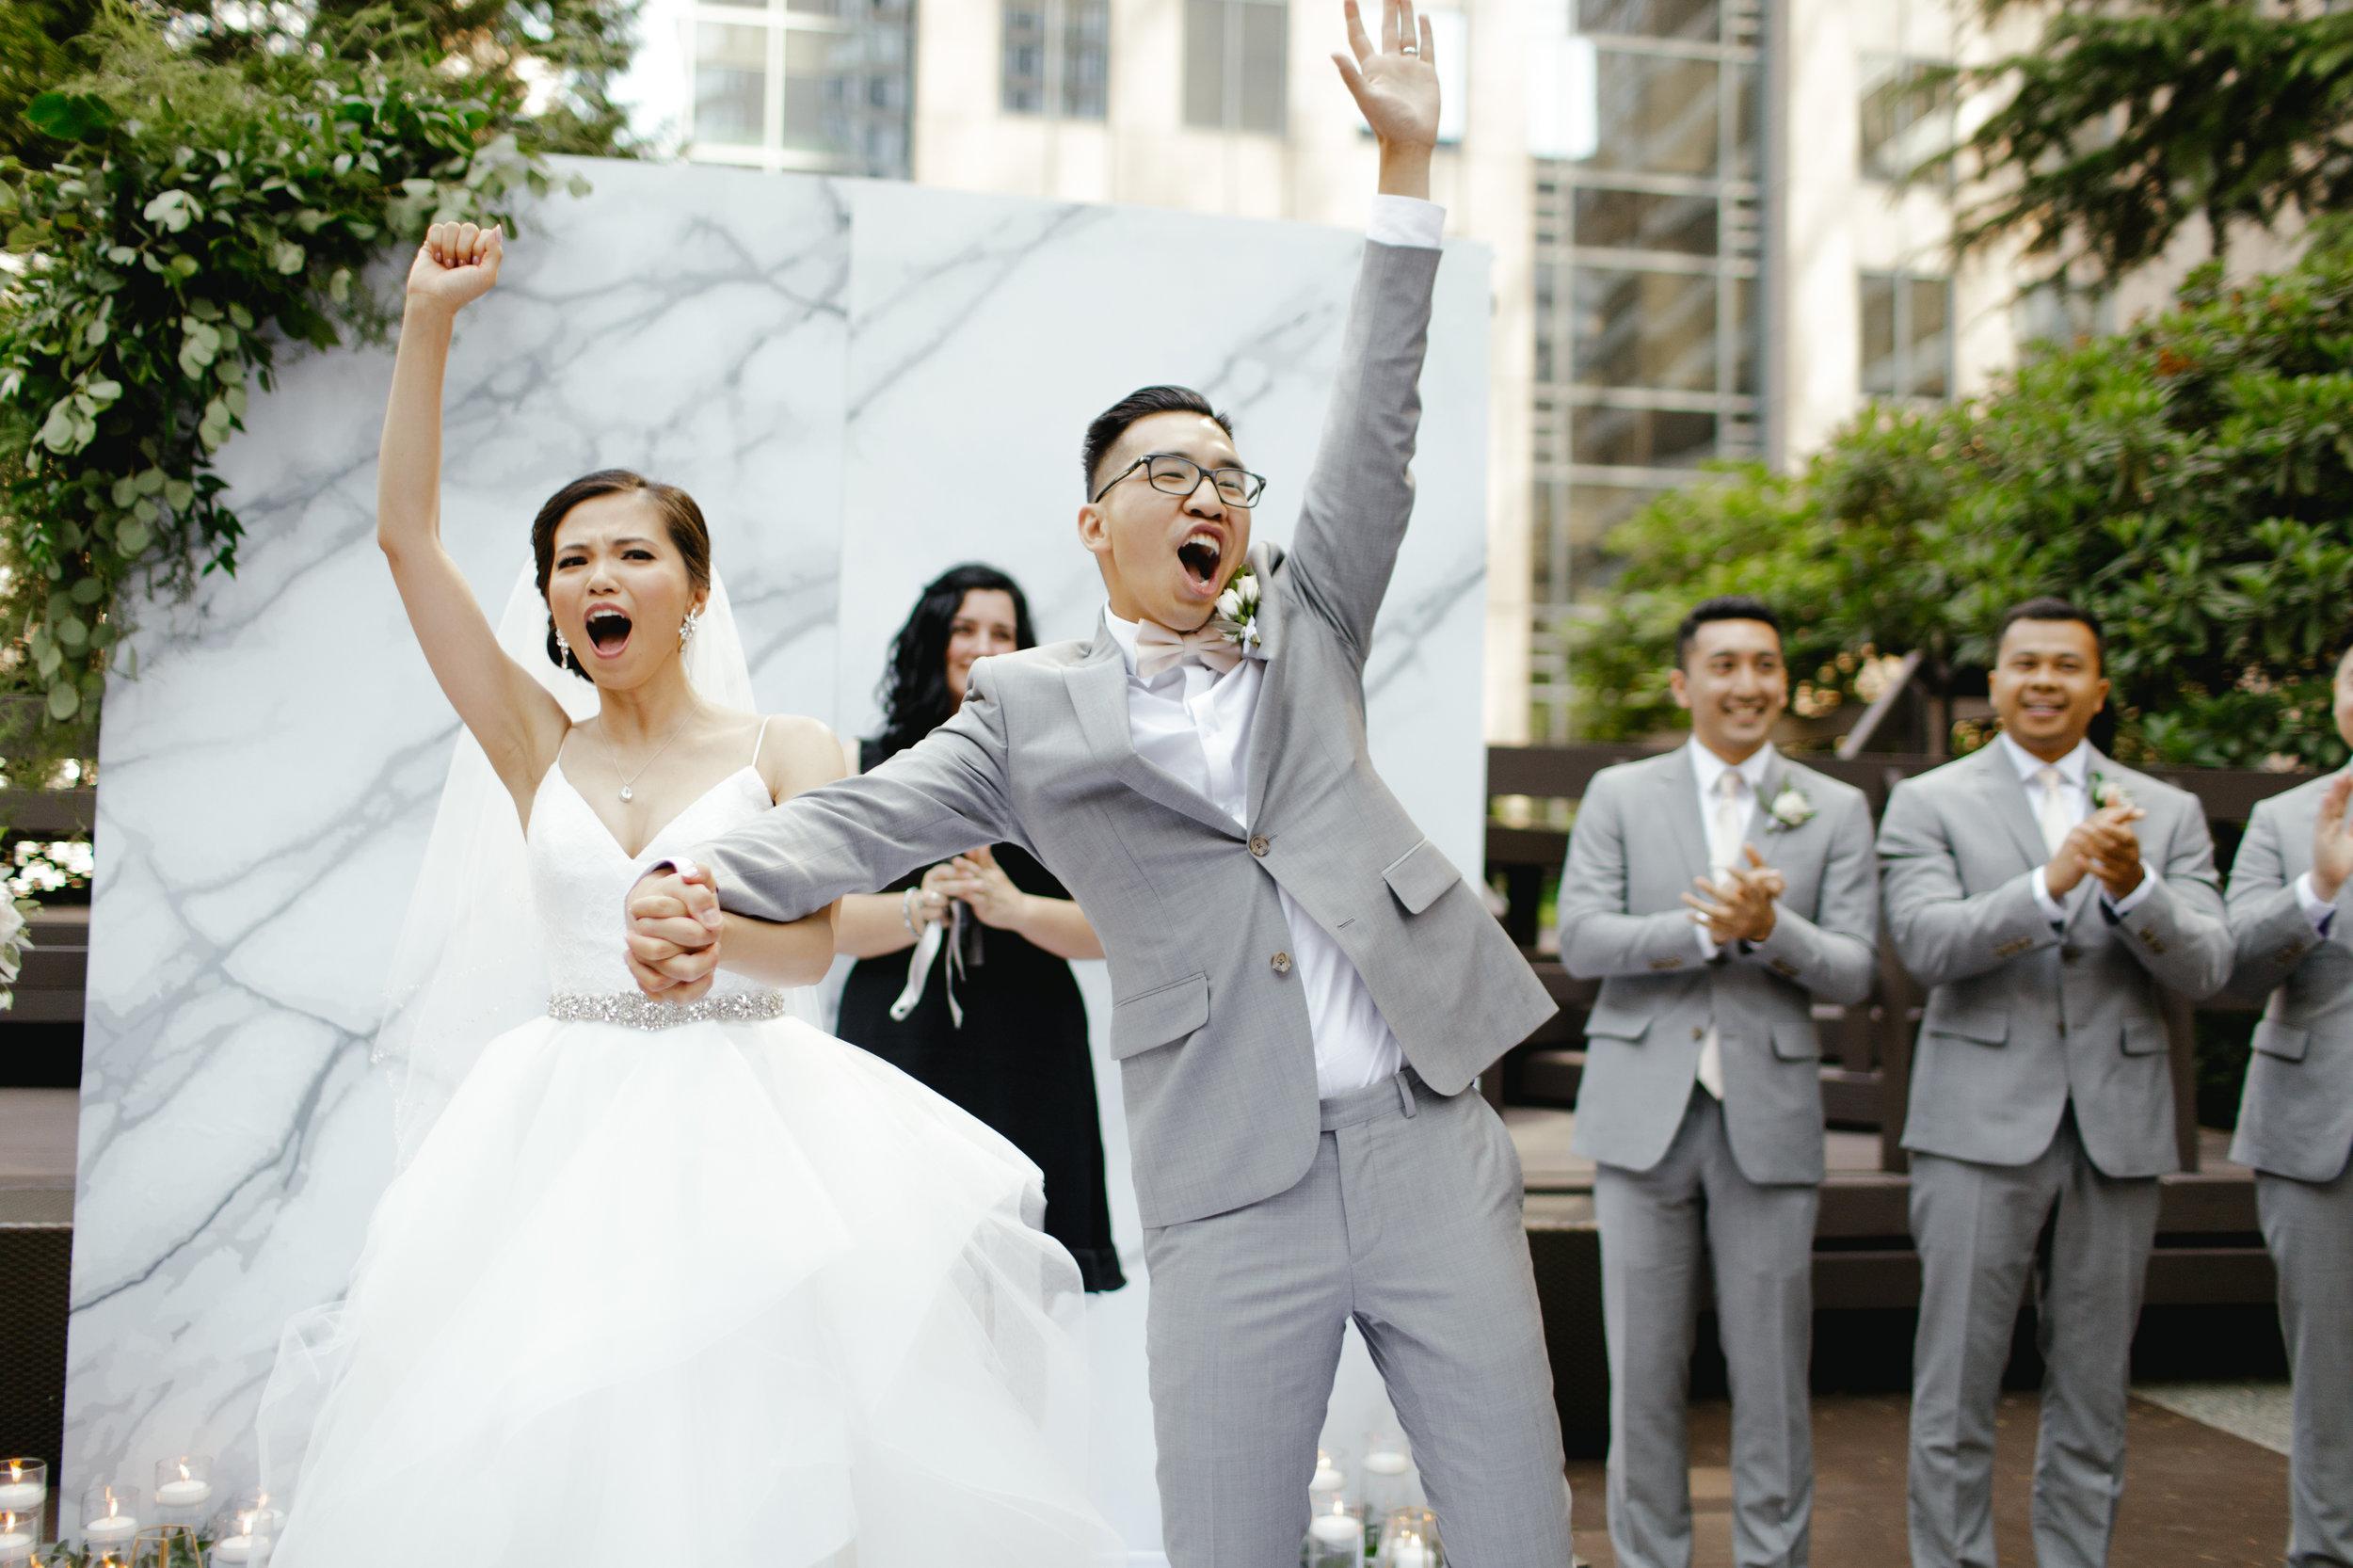 herastudios_wedding_nancy_james_hera_selects-91.jpg